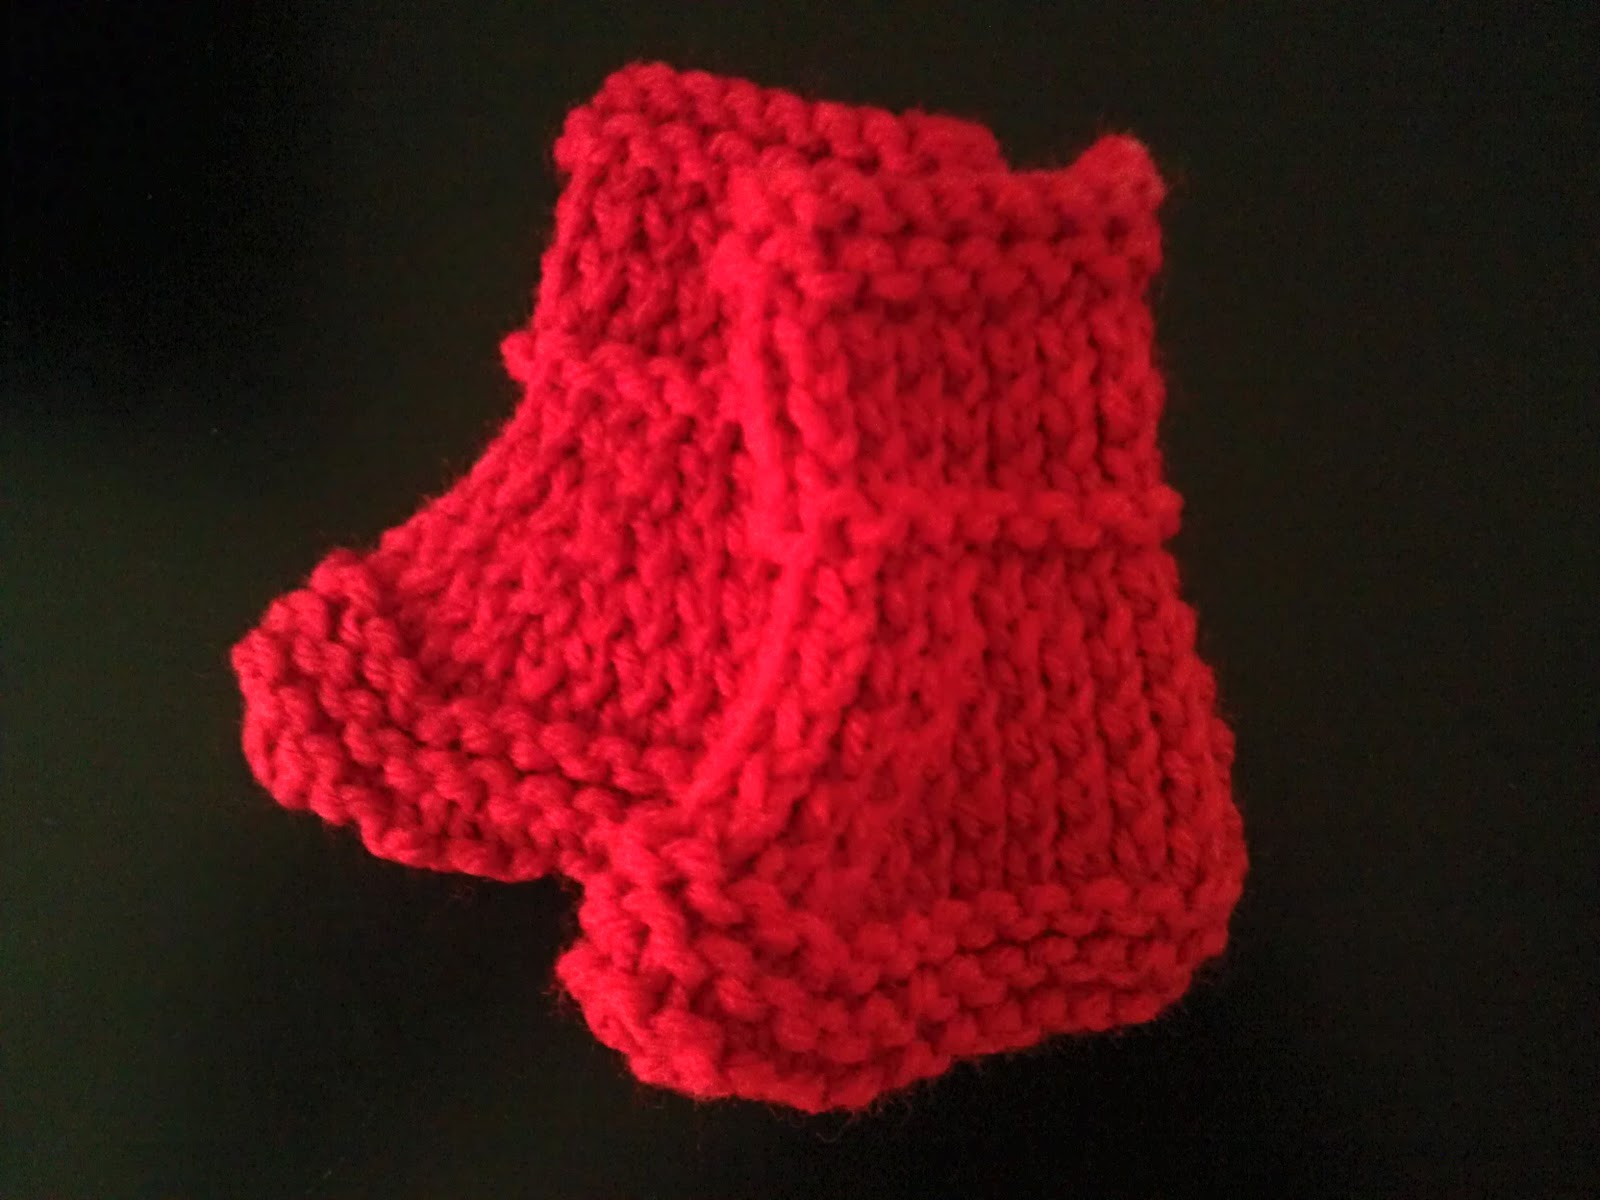 Knitting Patterns For Preemies : The Crafting Diva: Free Knitting Pattern: Preemie/Newborn Booties